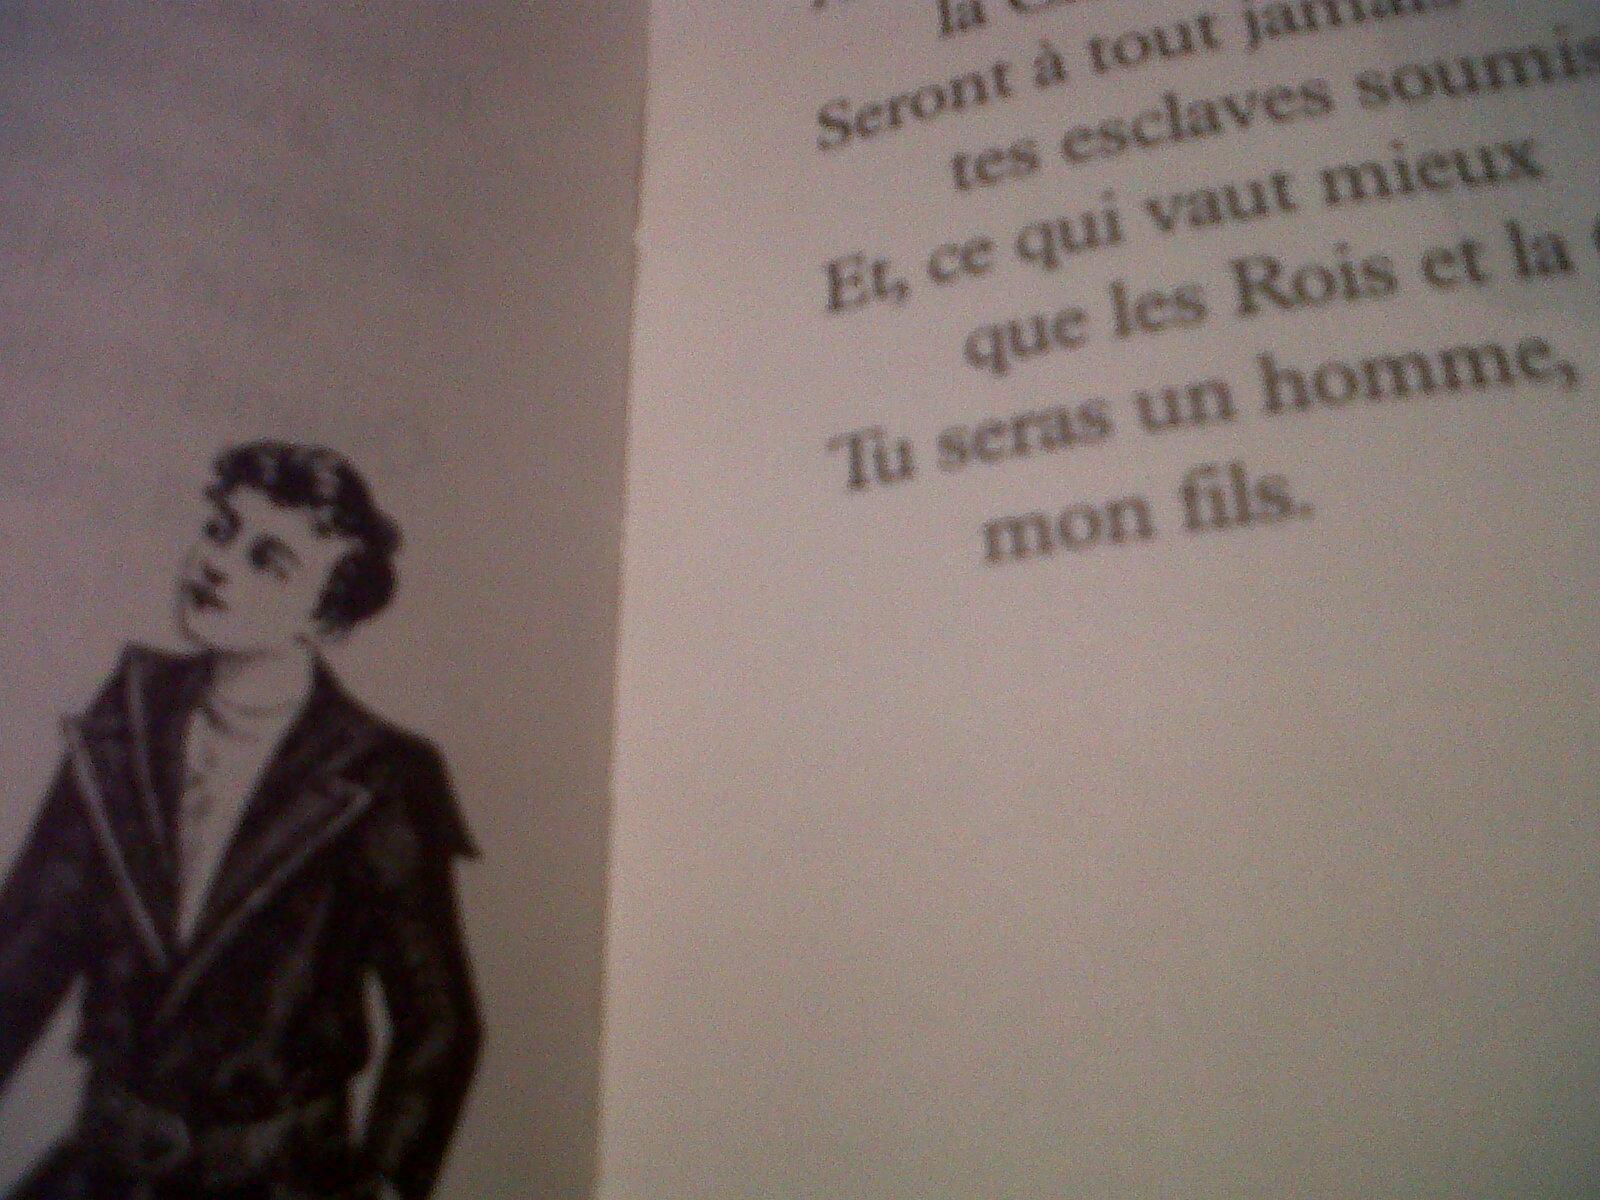 Si Tu Seras Un Homme Mon Fils Poème De Rudyard Kipling